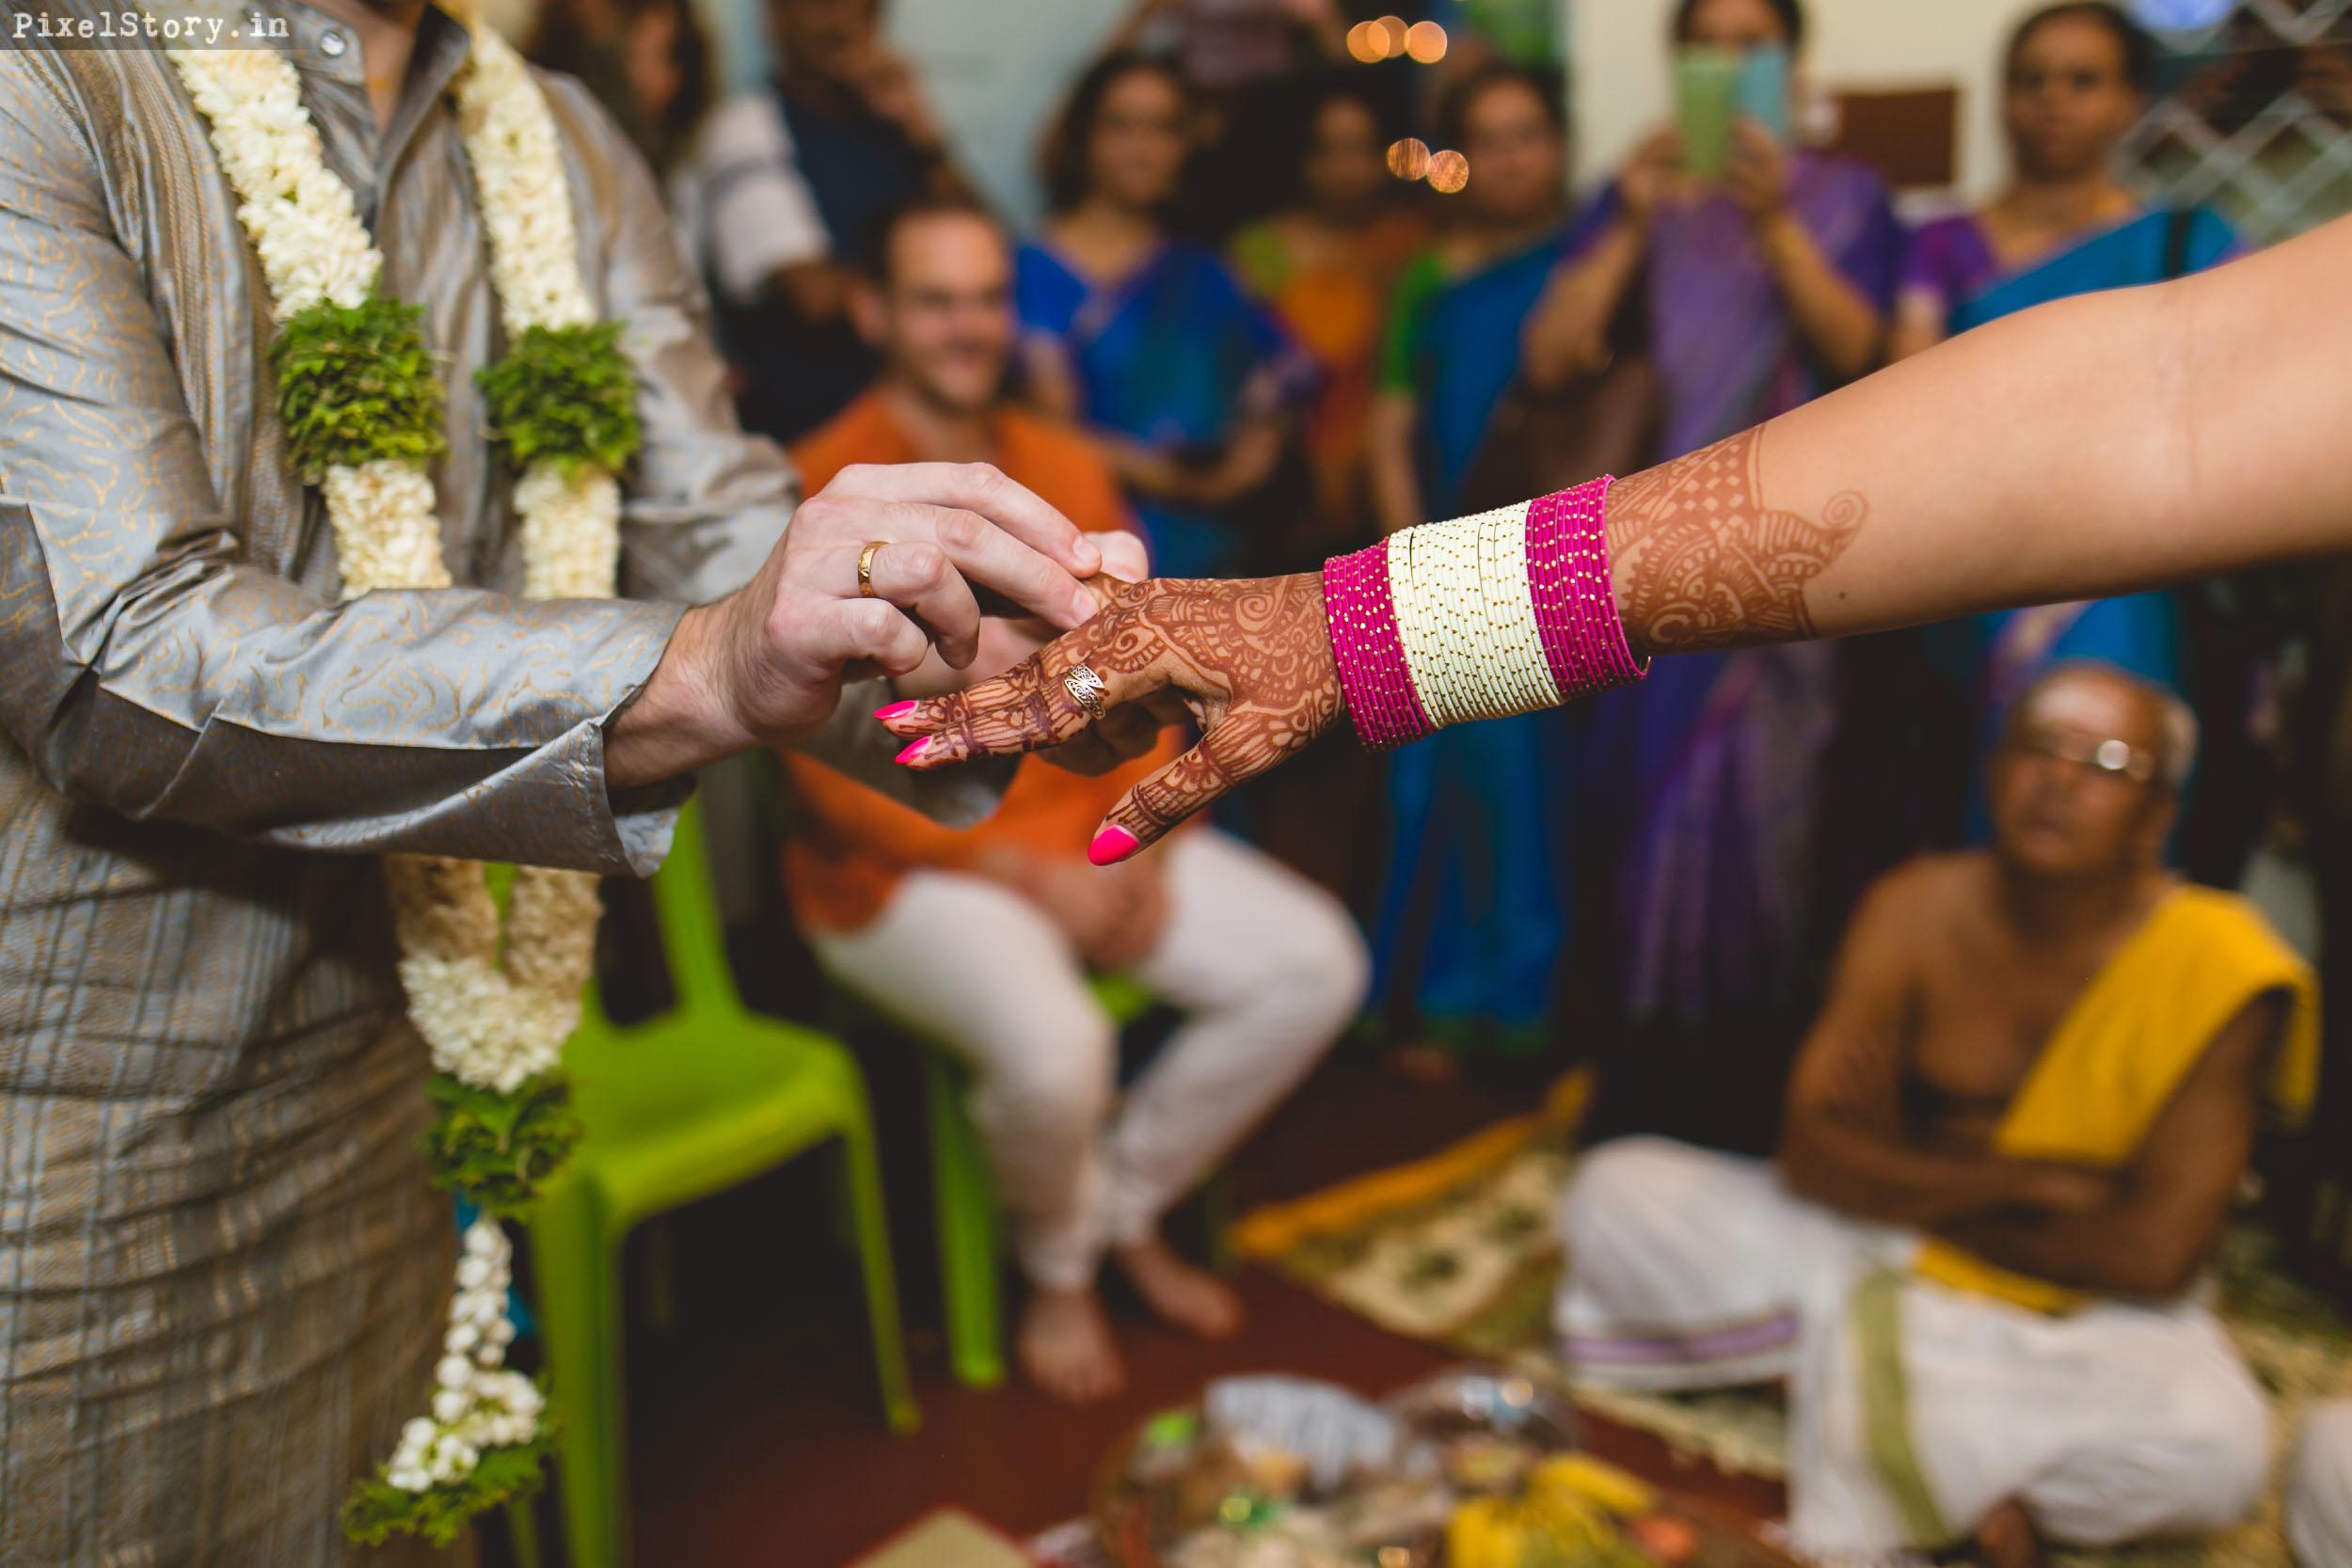 PixelStory-Jungle-Wedding-Photographer-Masinagudi-Indo-French007.jpg